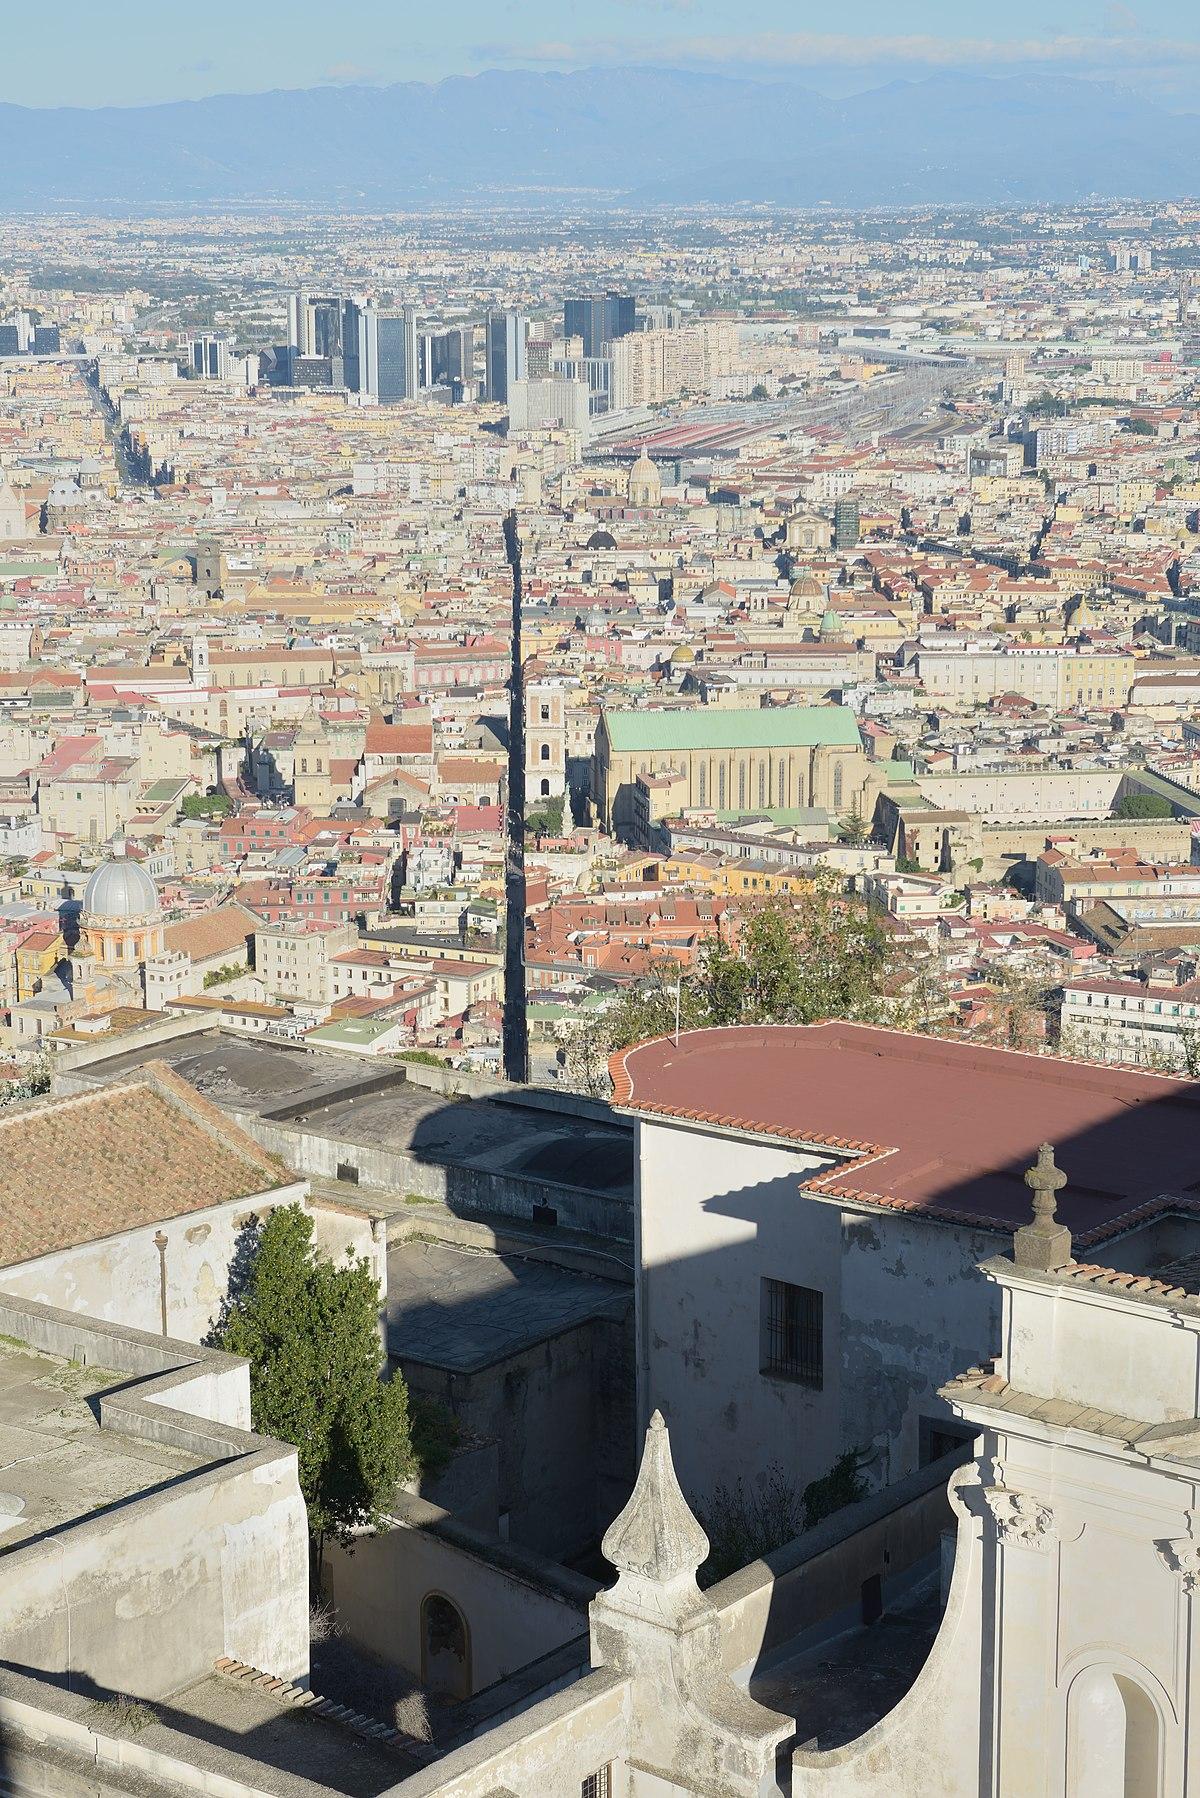 File Naples From The Castello Sant Elmo With Abbazia San Martino And Spaccanapoli Jpg Wikimedia Commons